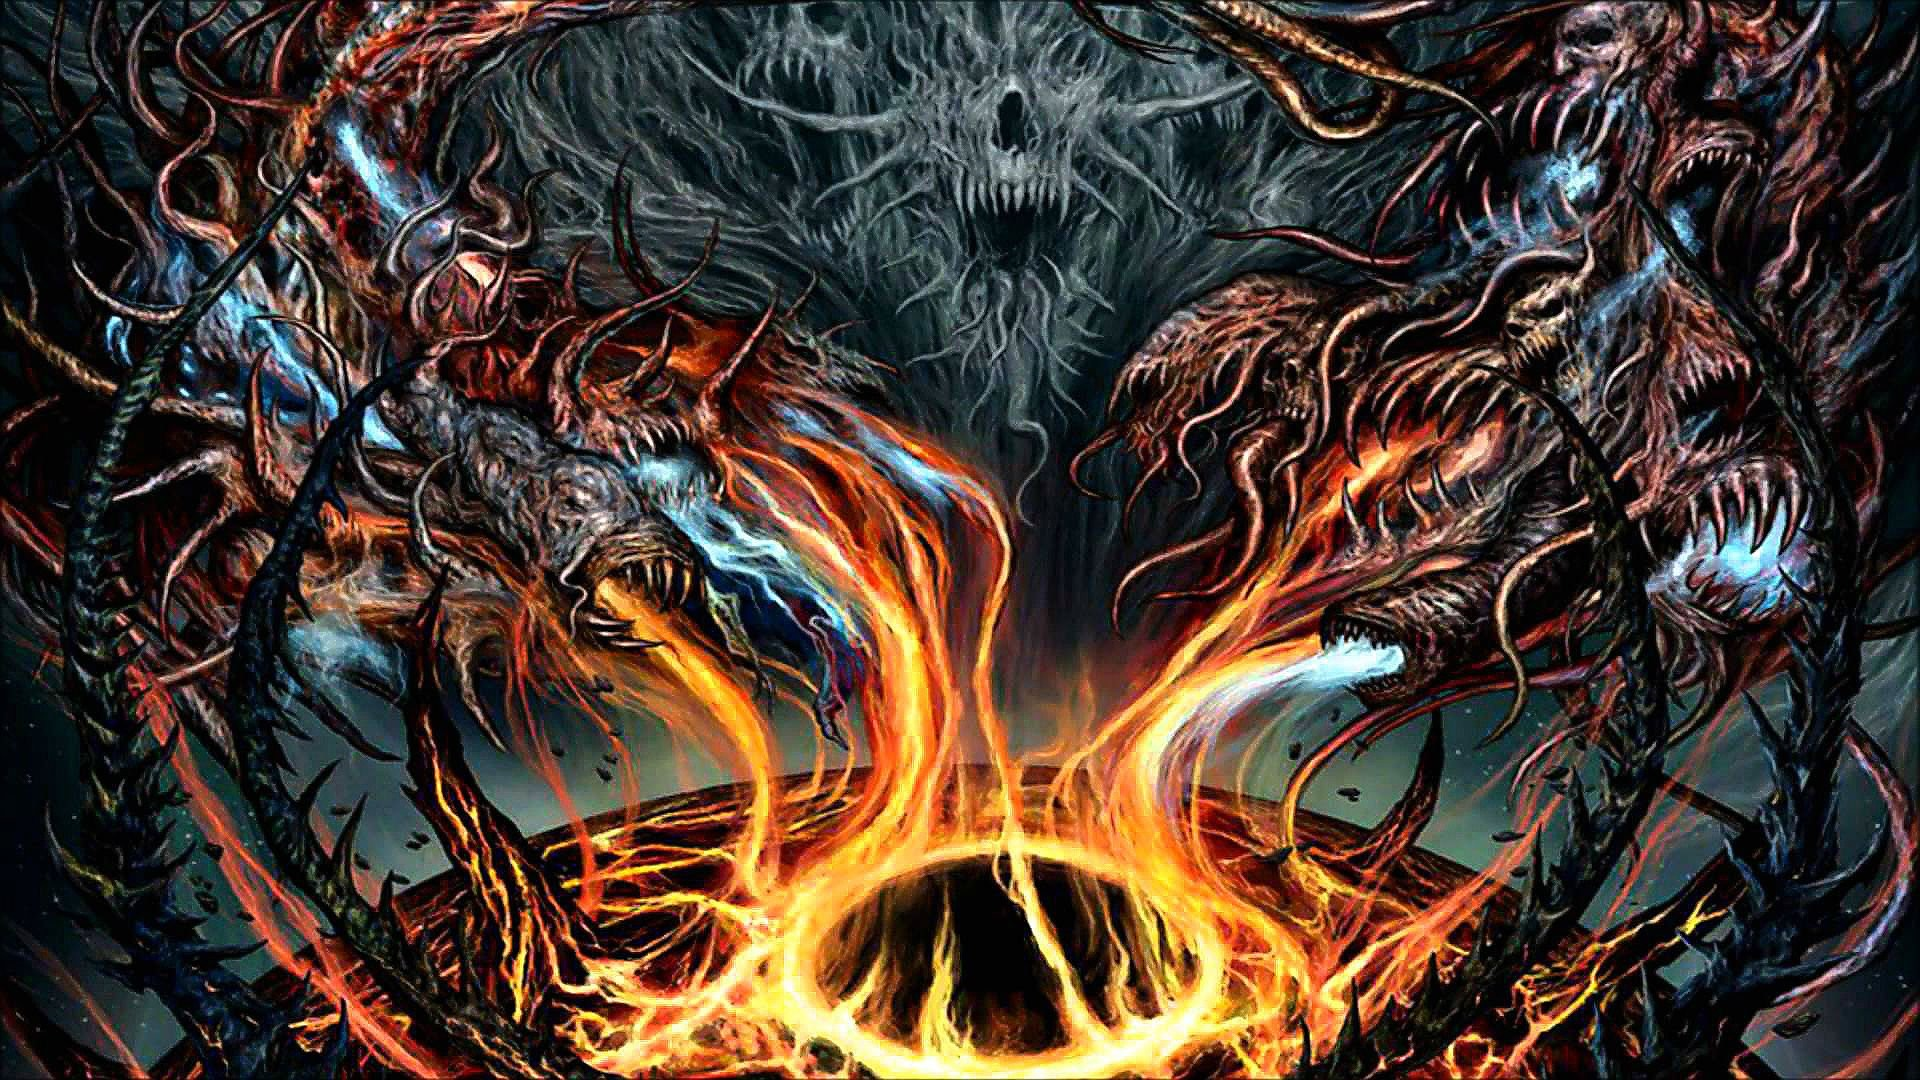 Death metal art wallpaper 54 images - Death metal wallpaper ...